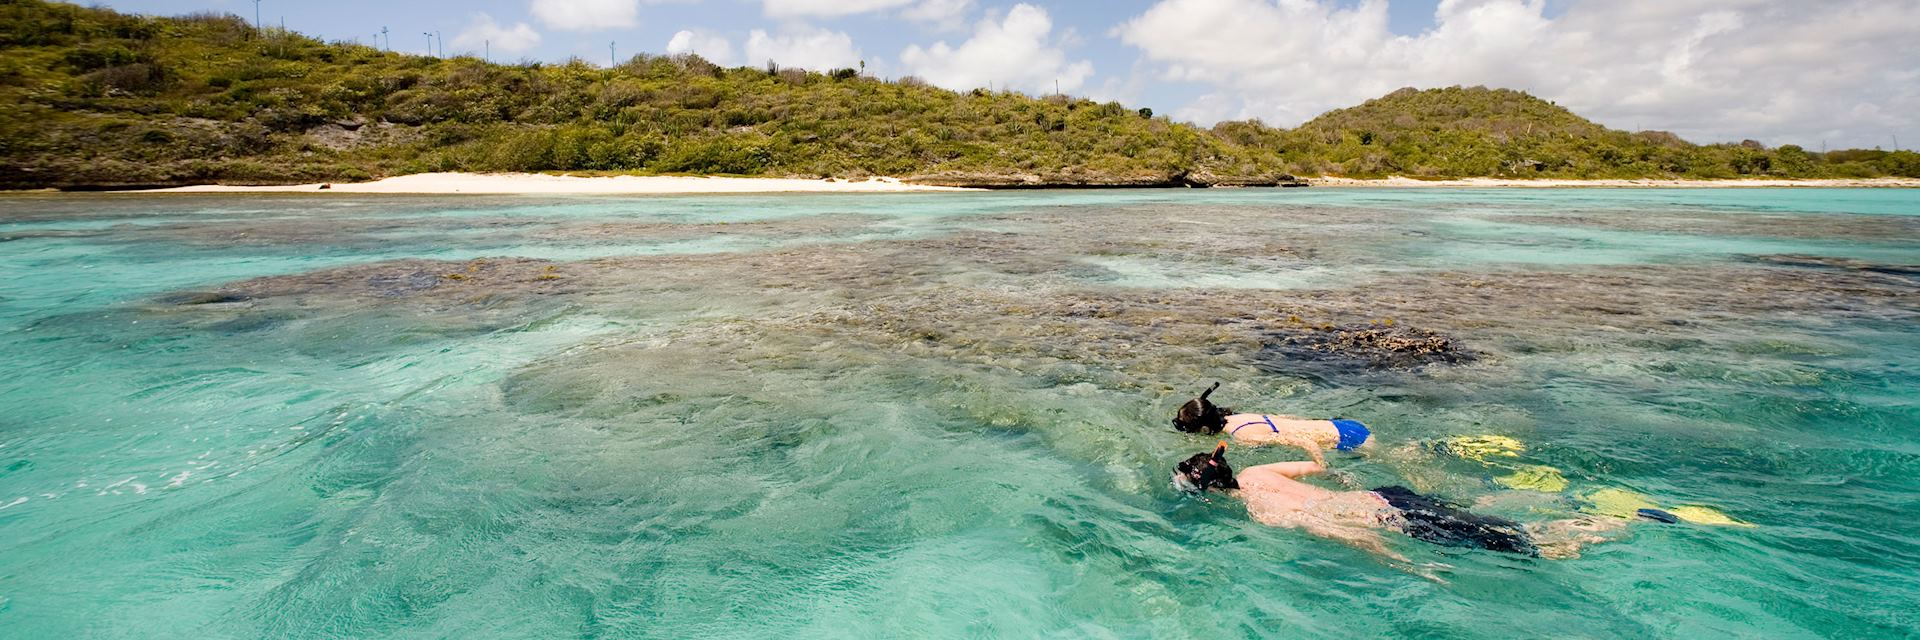 Snorkelling, Green Island, Antigua